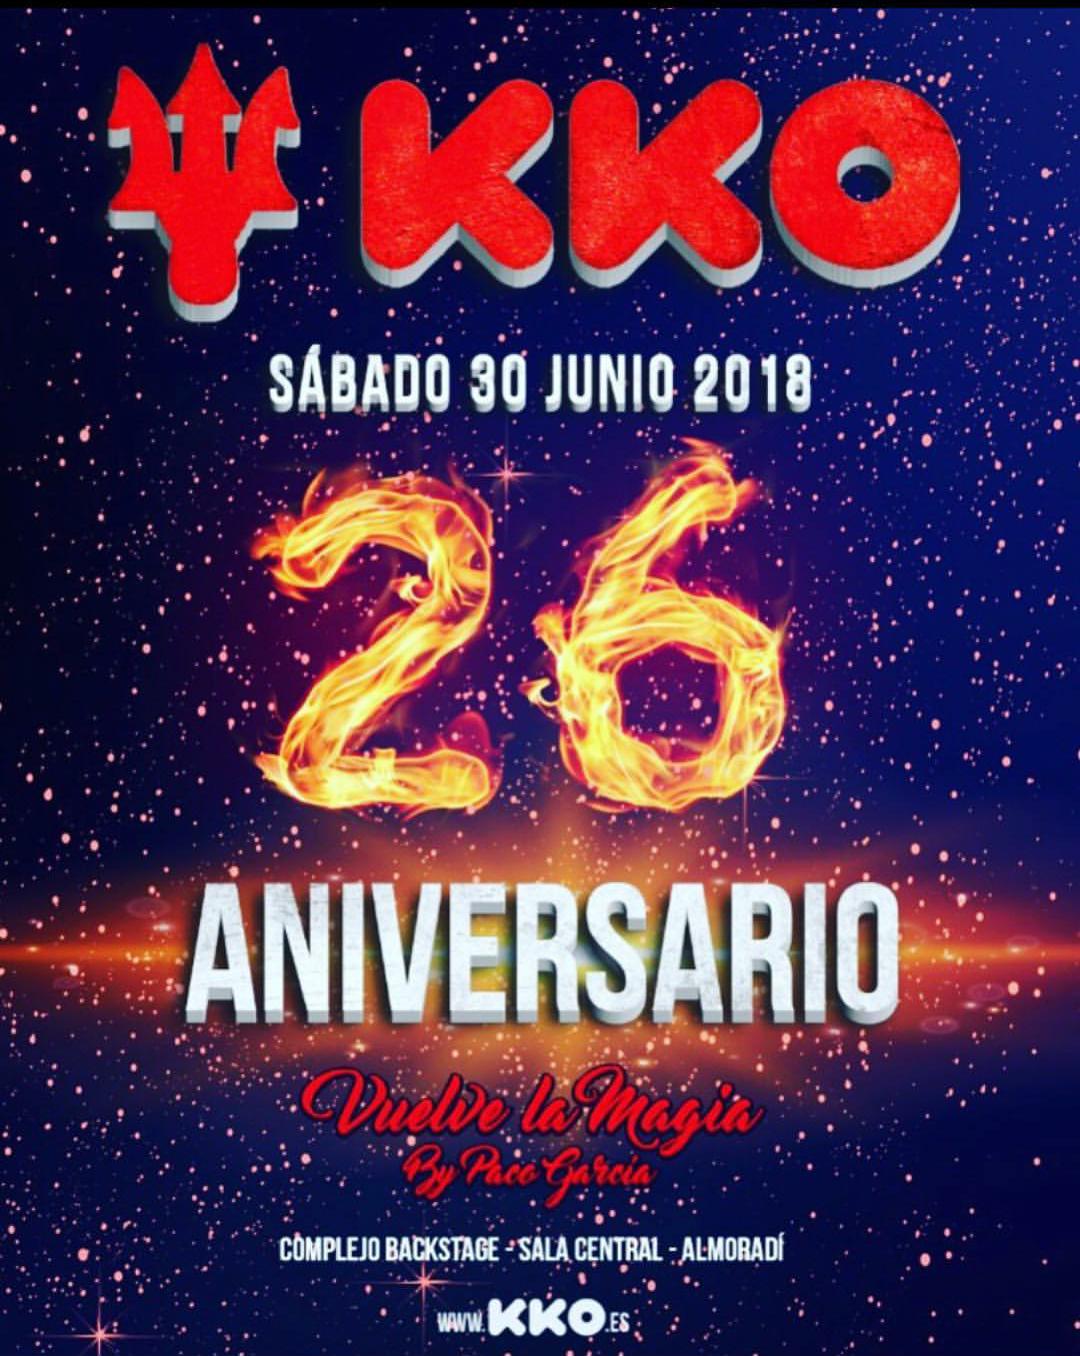 KKO - 26 aniversario